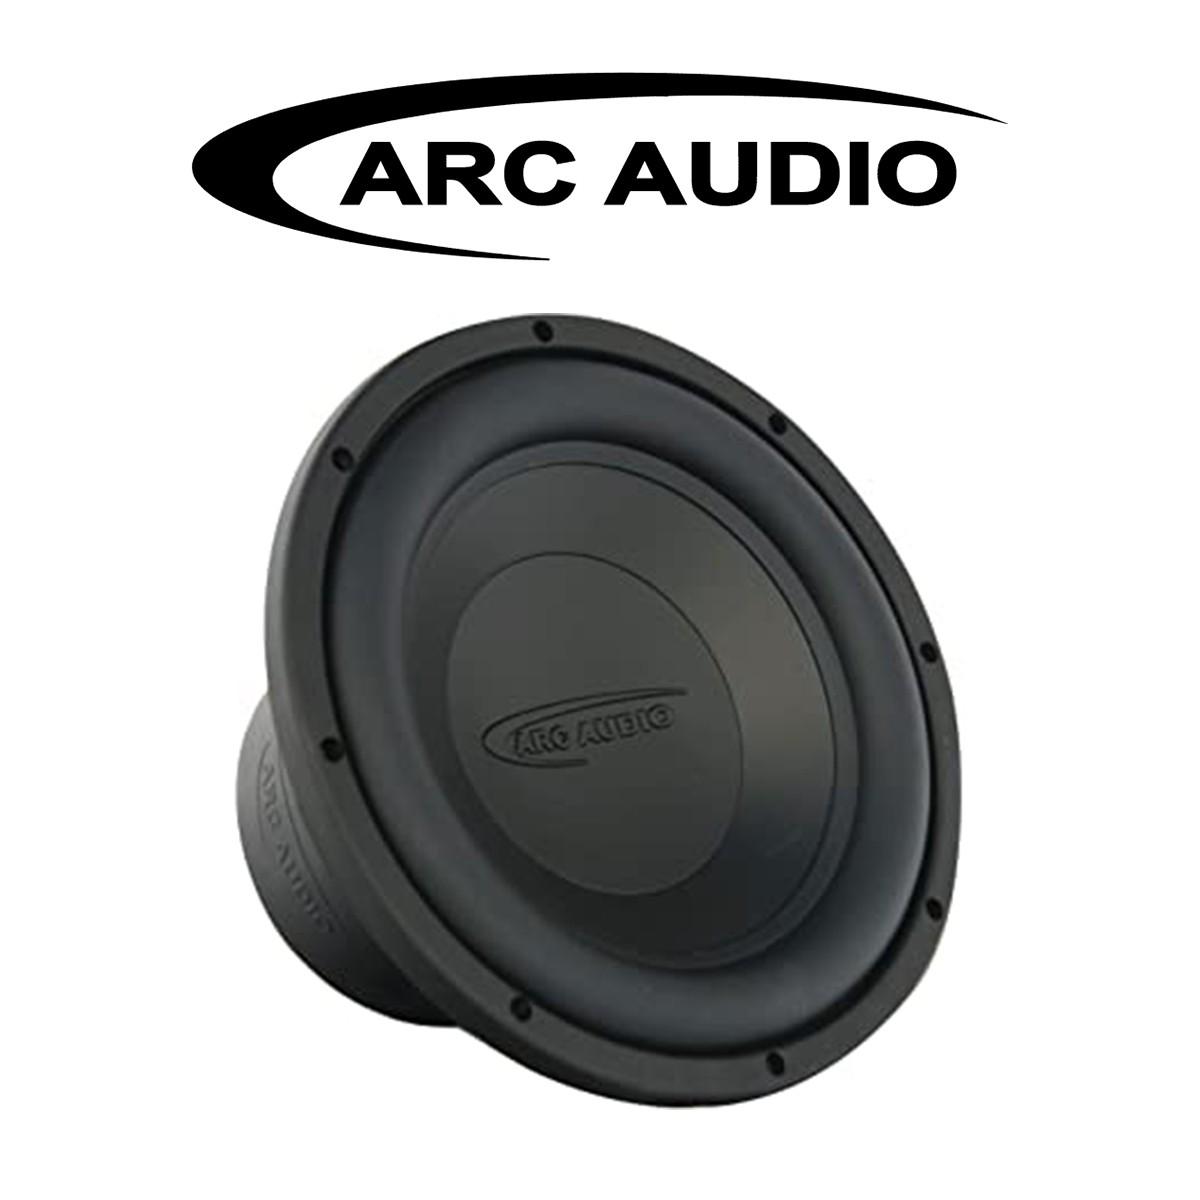 ARC AUDIO 12D4 V3 - SUBWOOFER PASIF 12 INCHI